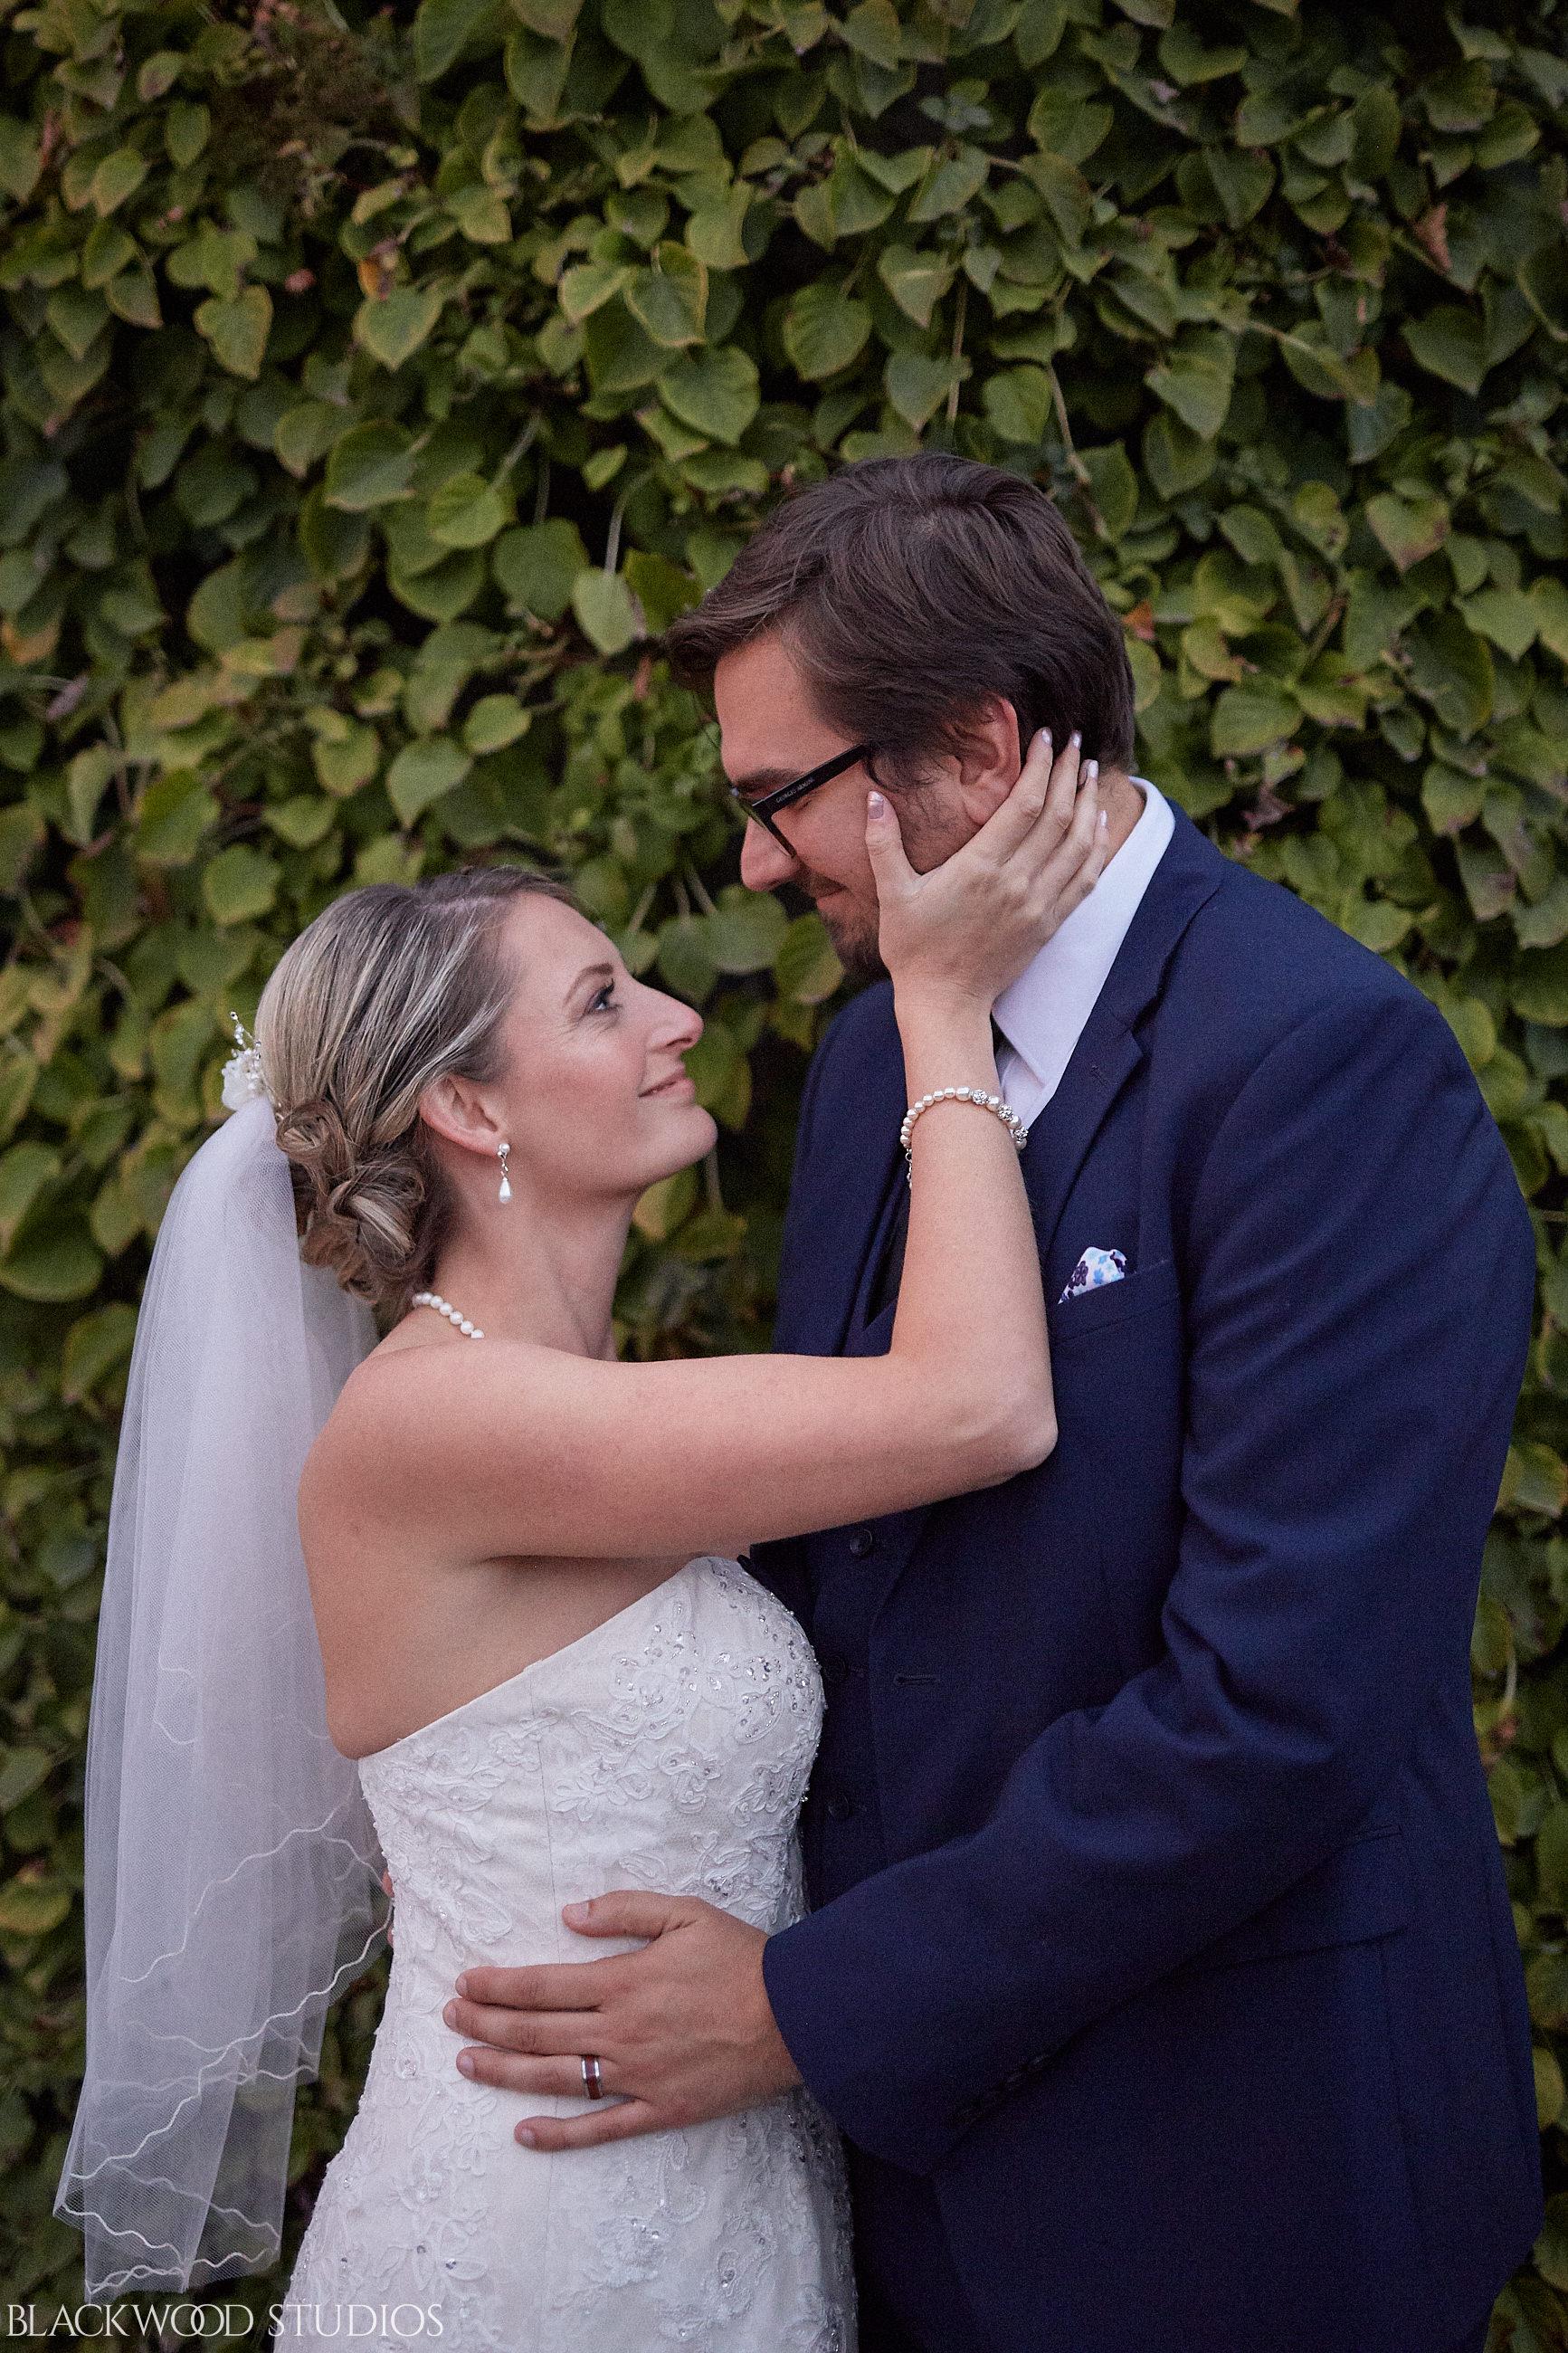 Blackwood-Studios-Wedding-Photography-20170928-190638-Marek-Katie-Michalek-Oakes-Garden-Theatre-Niagara-Falls-Ontario-Canada.jpg